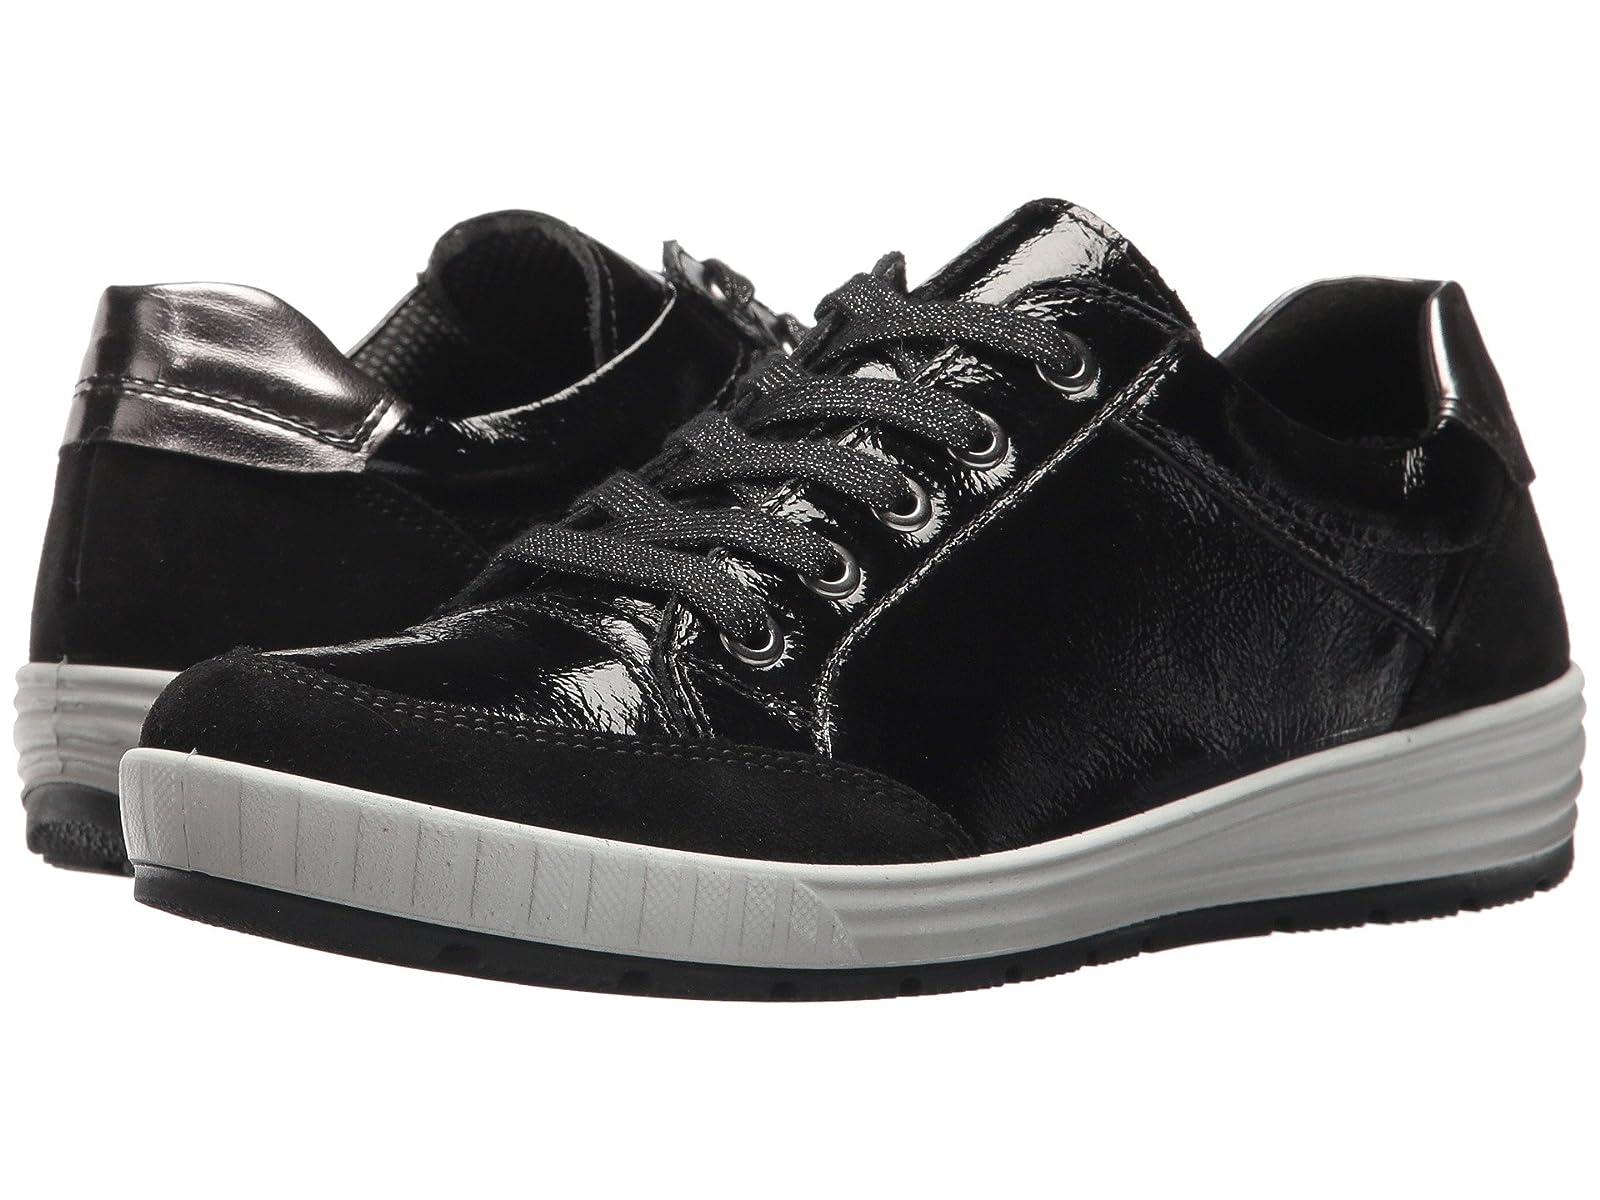 ara NicoleAtmospheric grades have affordable shoes